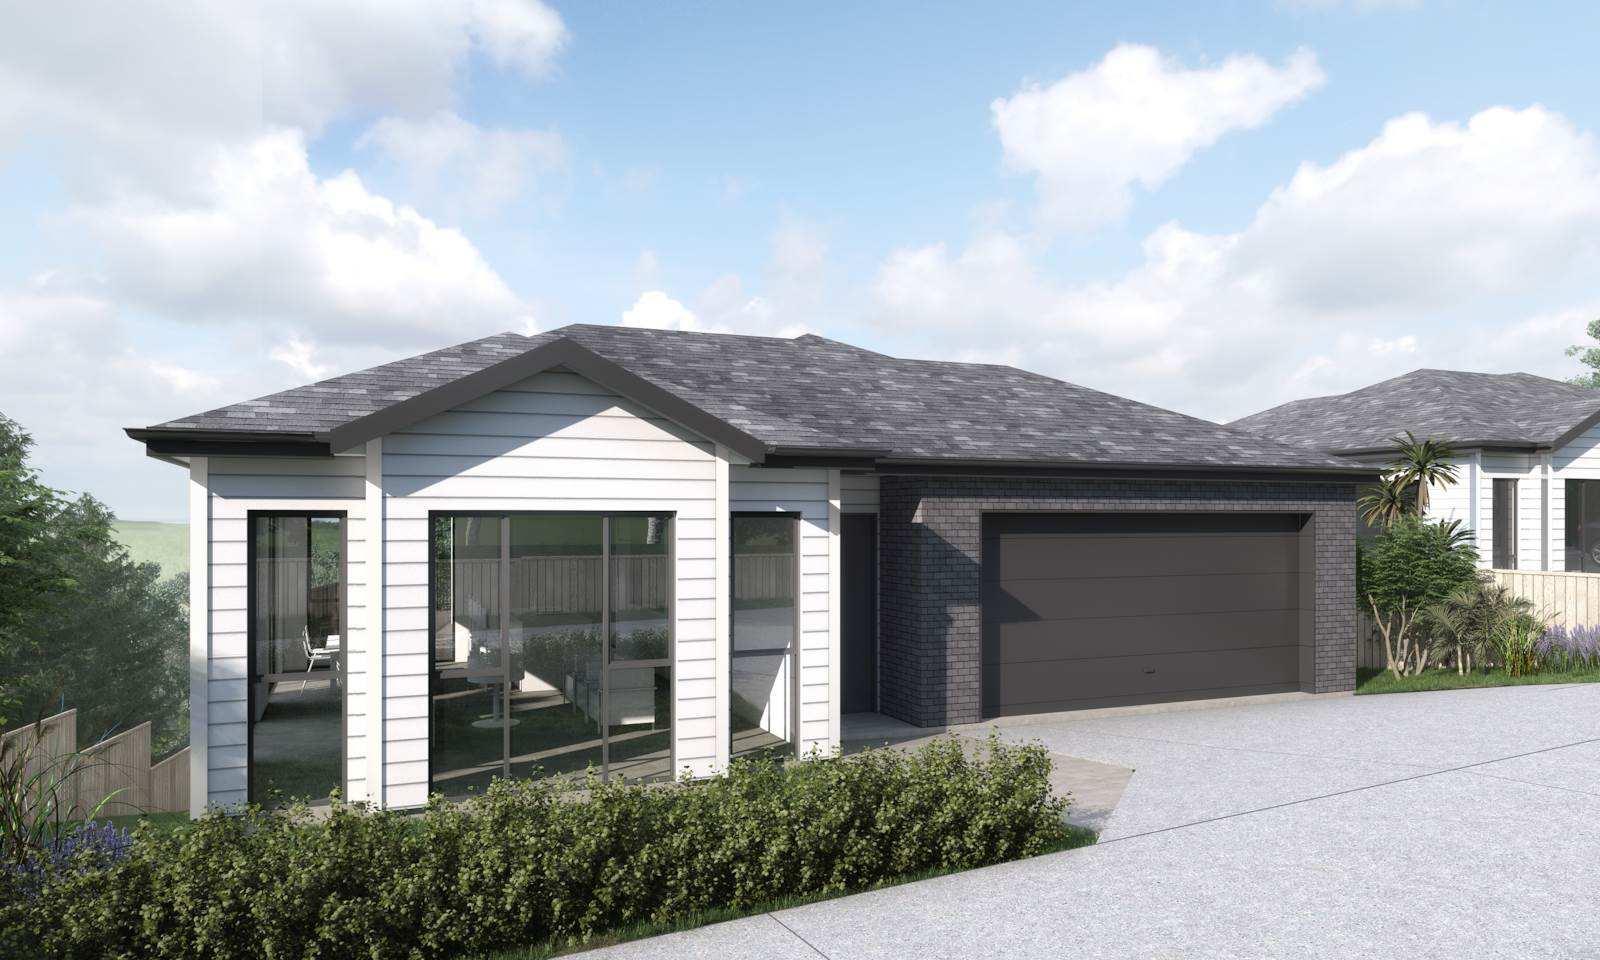 Tuakau 4房 住宅+土地组合 10年建筑质保 15分钟上高速 配套应有尽有 您完美的首房新居! Your Brand New First Home!